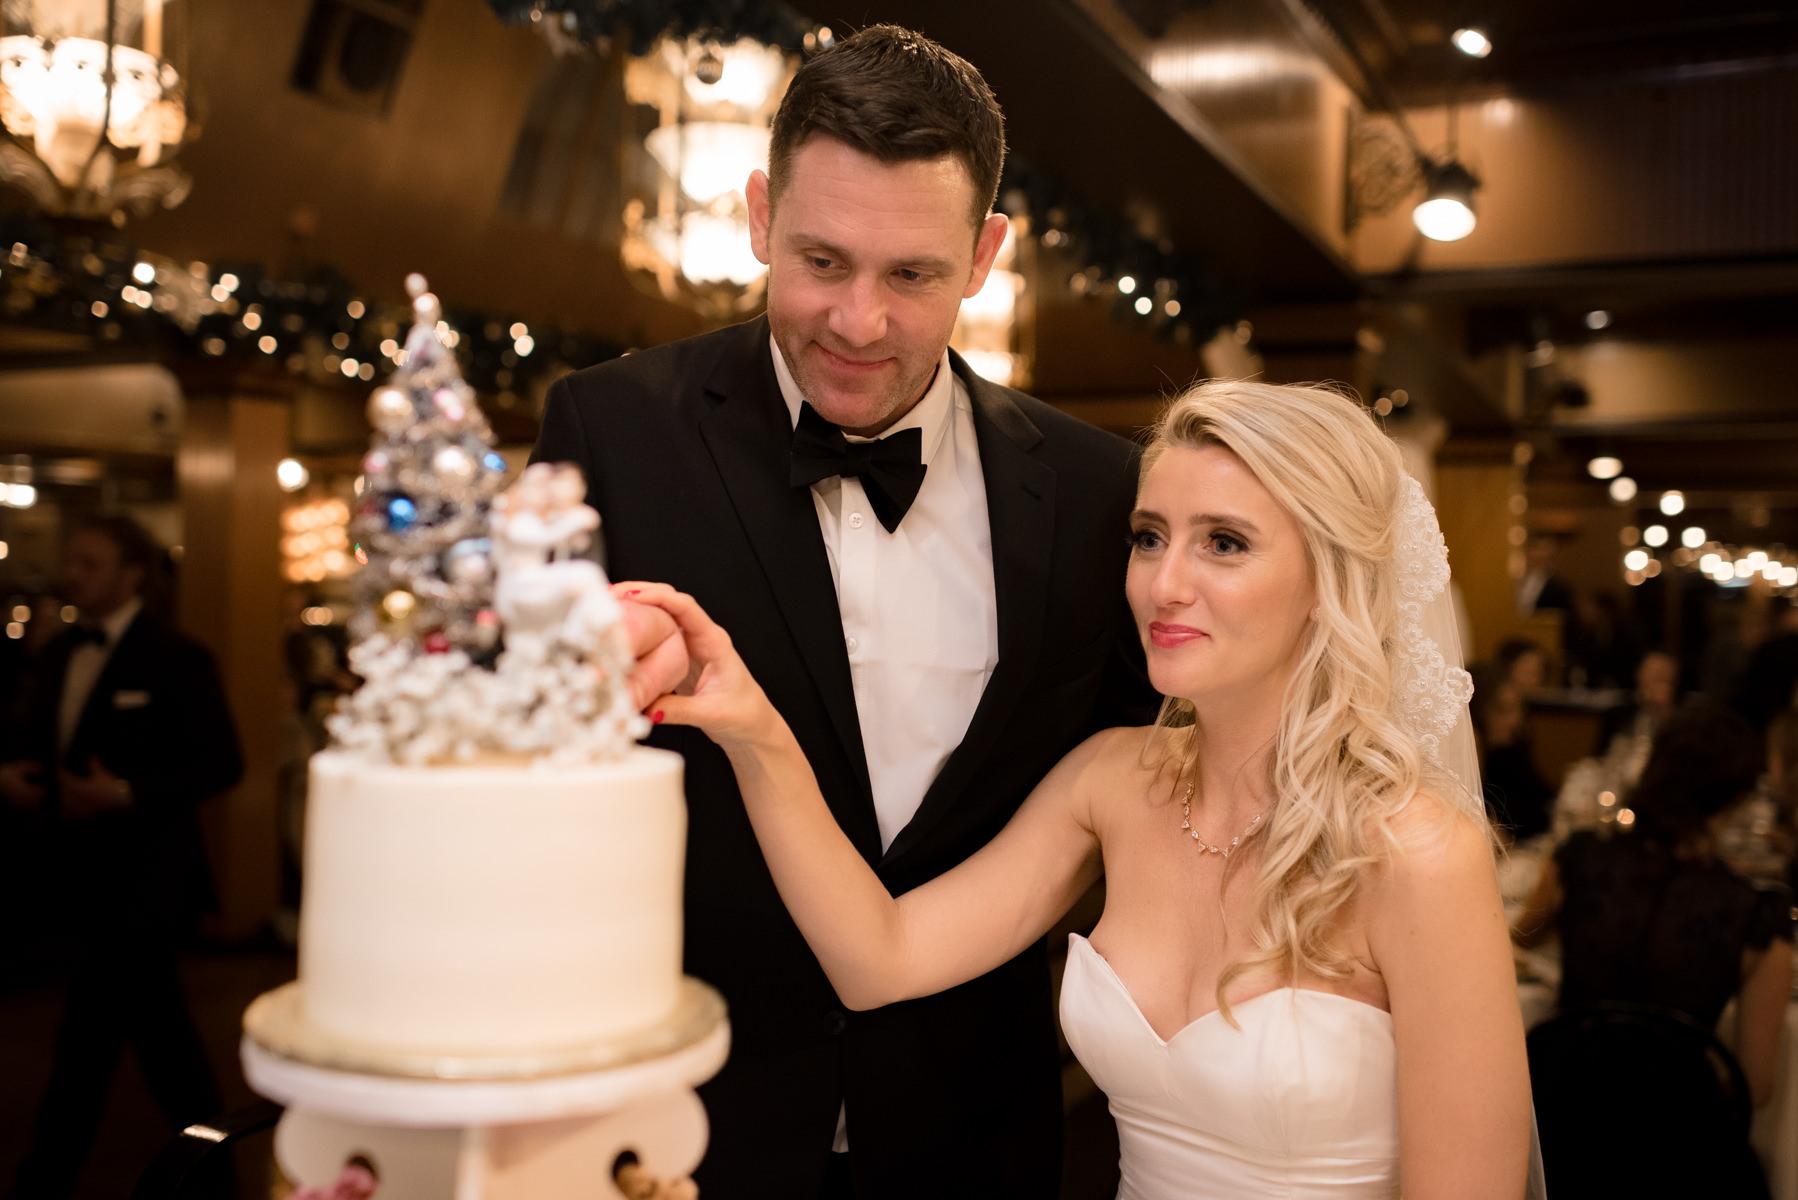 Andrew Tat - Documentary Wedding Photography - Lake Union Cafe - Seattle, Washington -Rachel and Ryan - 33.jpg